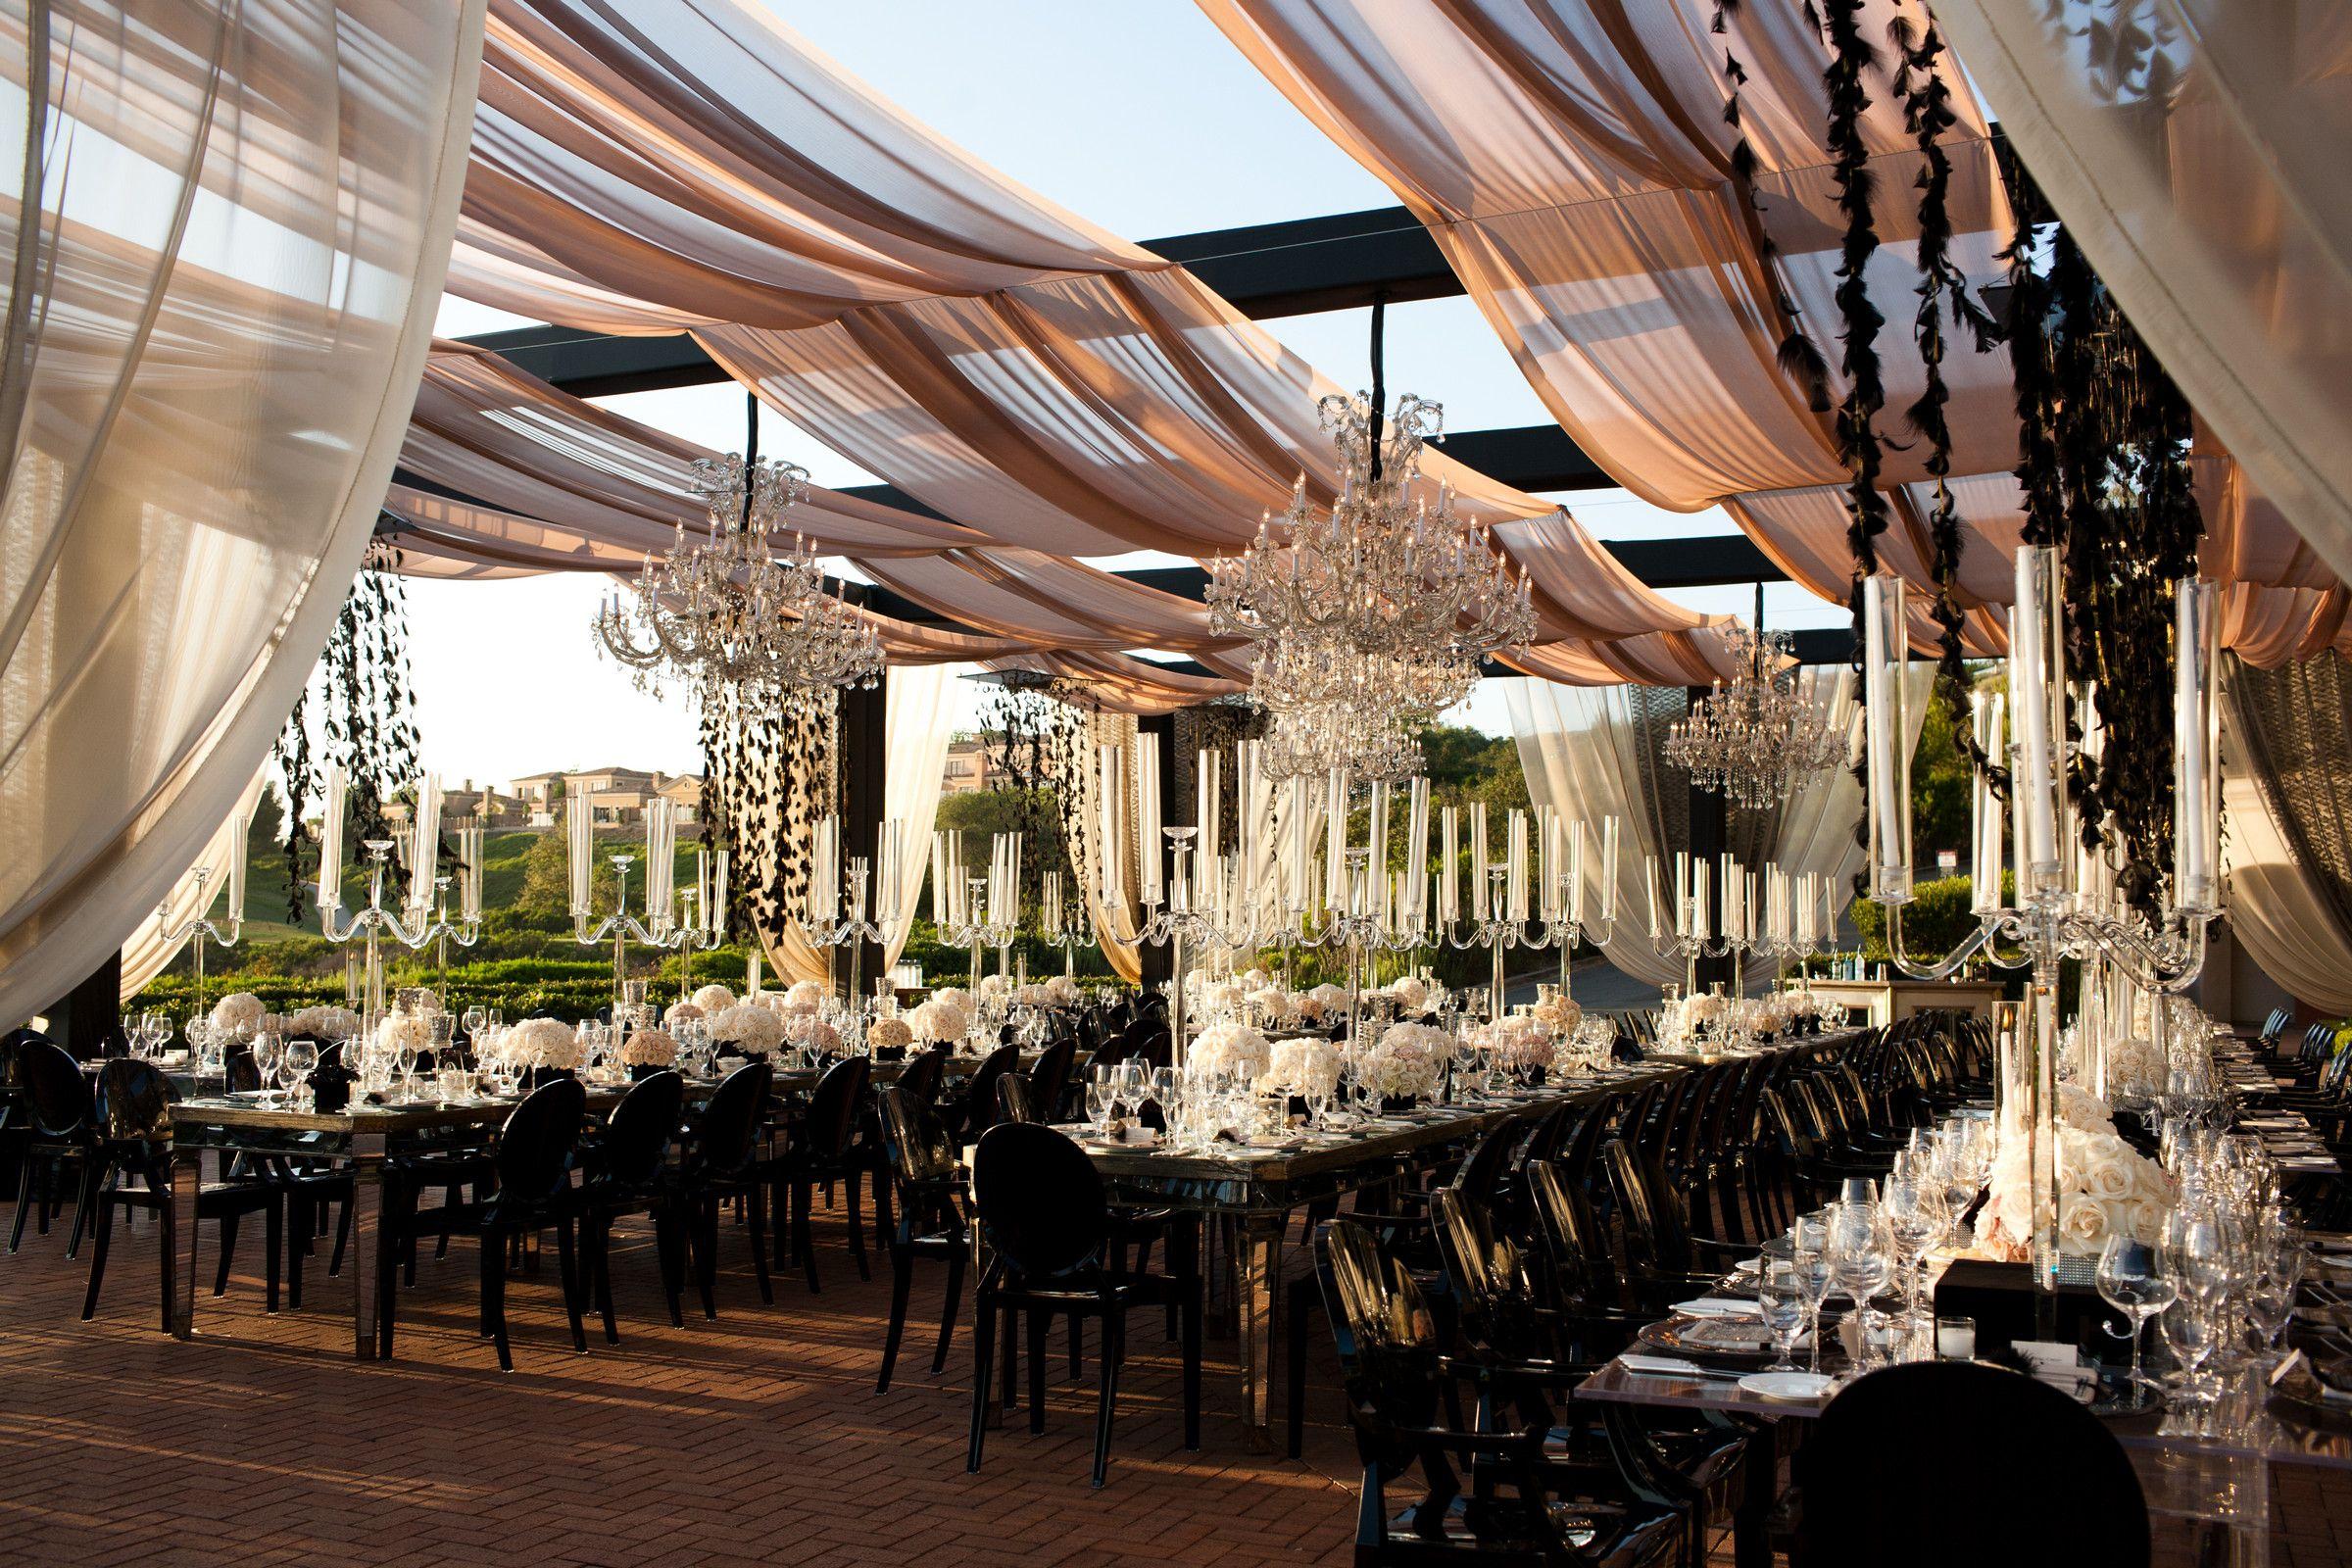 wedding tent lighting ideas. Amazing Wedding Ideas Tent Lighting R